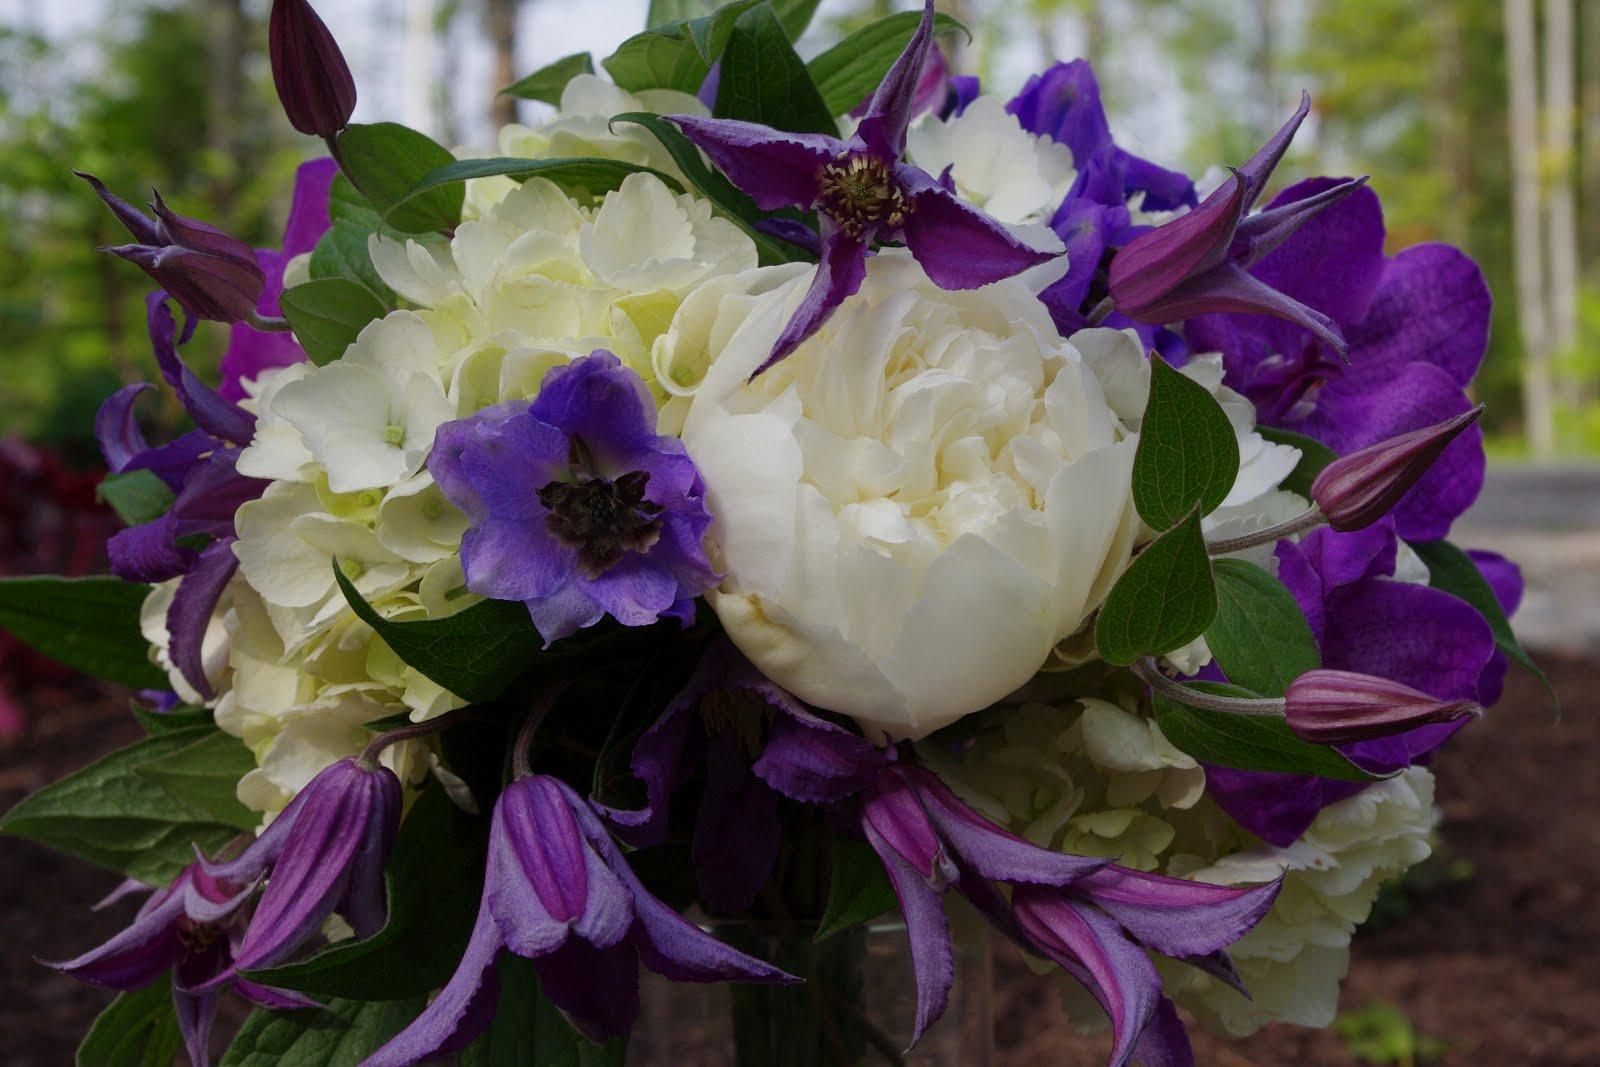 White hydrangea, purple